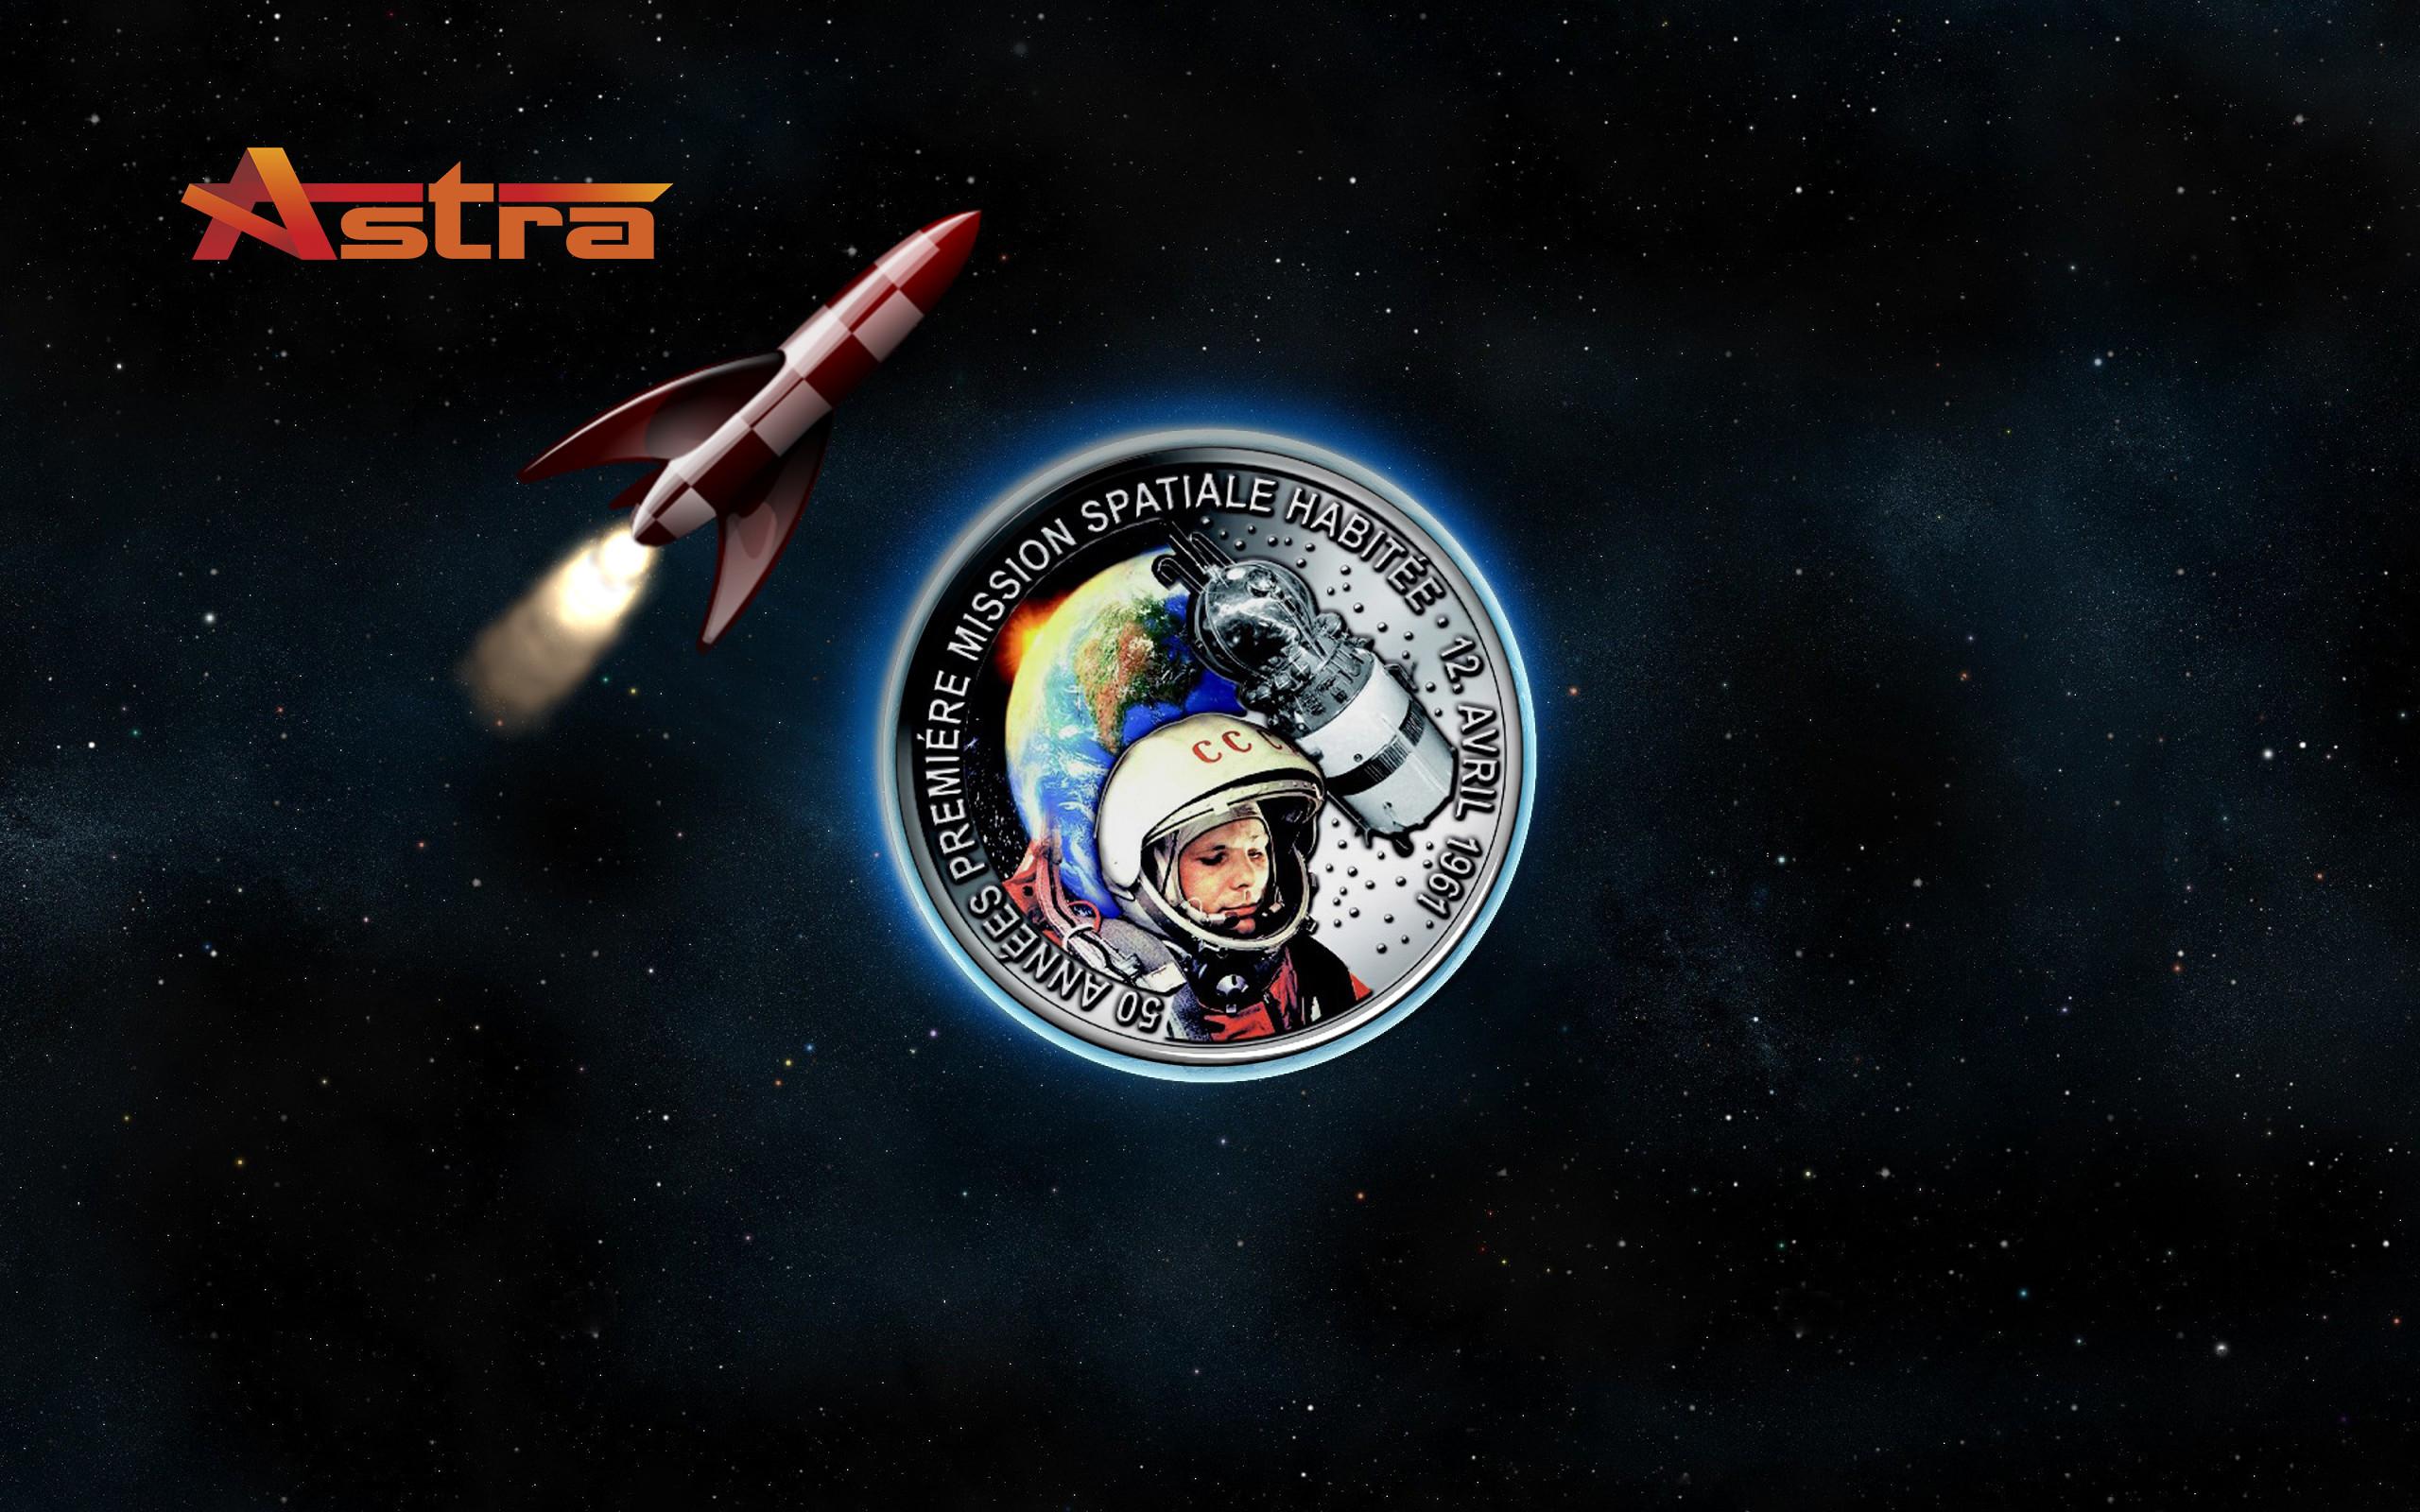 … Yuri Gagarin, wallpaper for Astra by WalentyWalewski